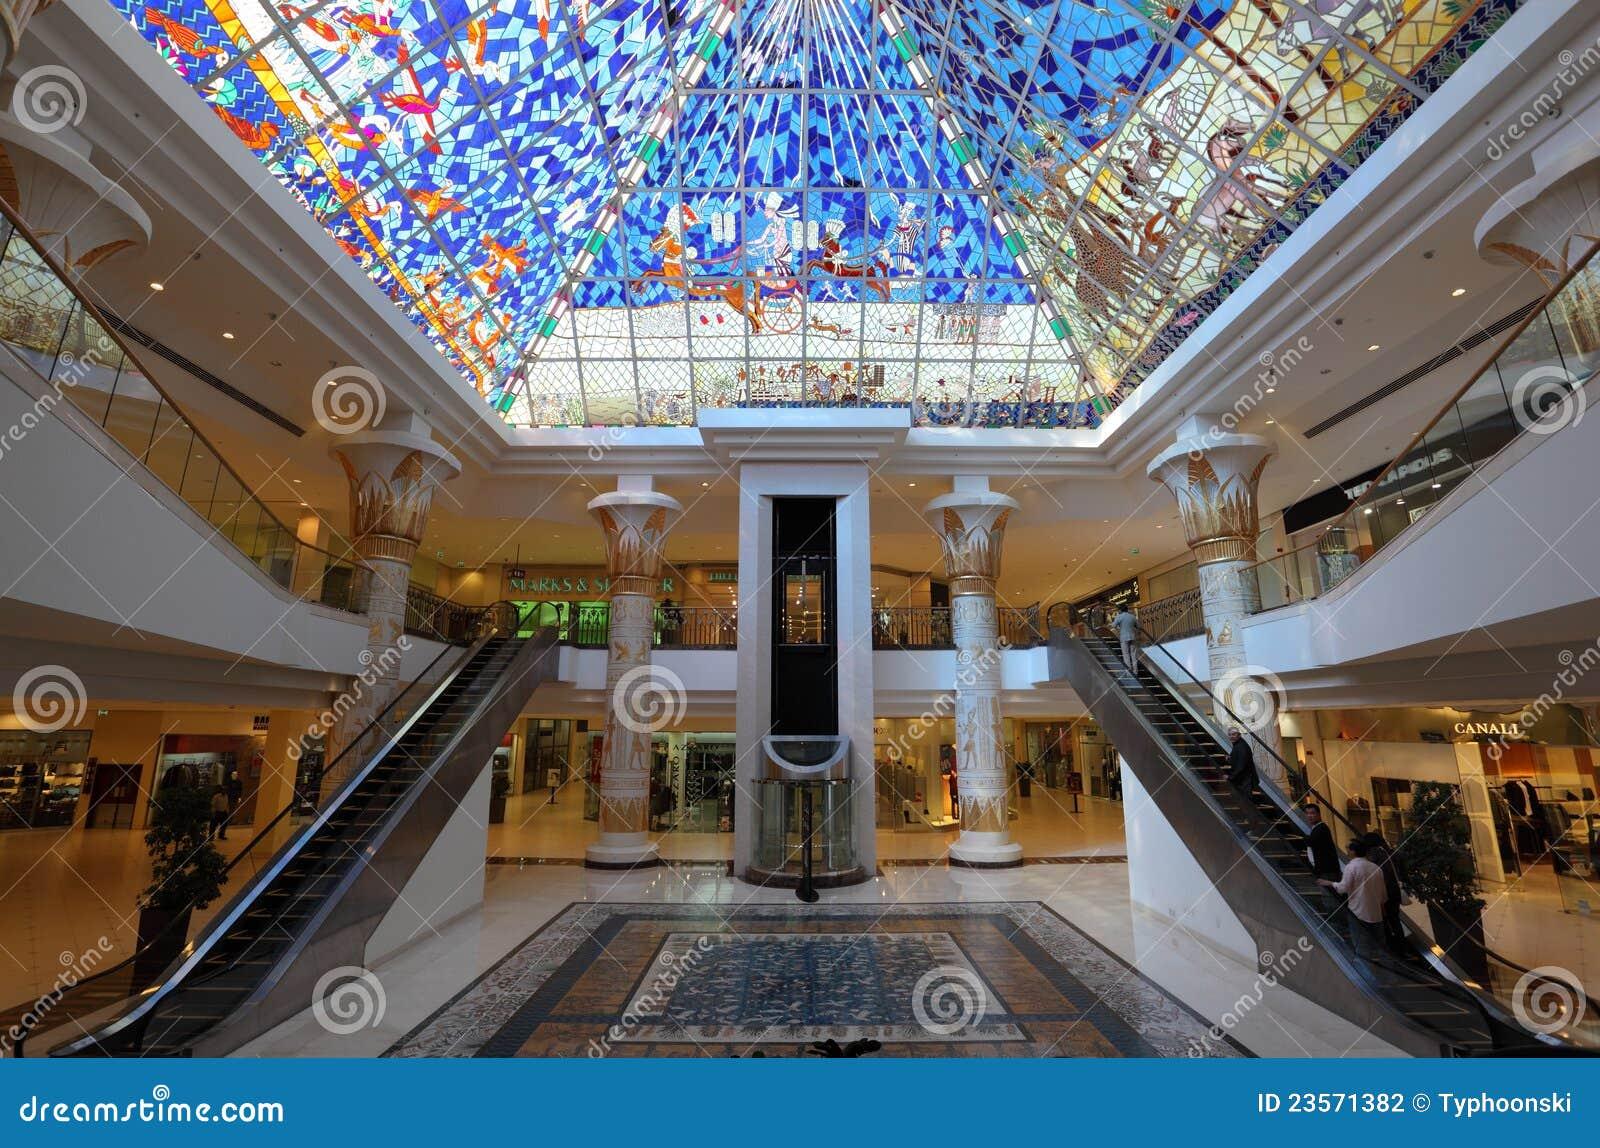 Dubai centrum handlowego wafi